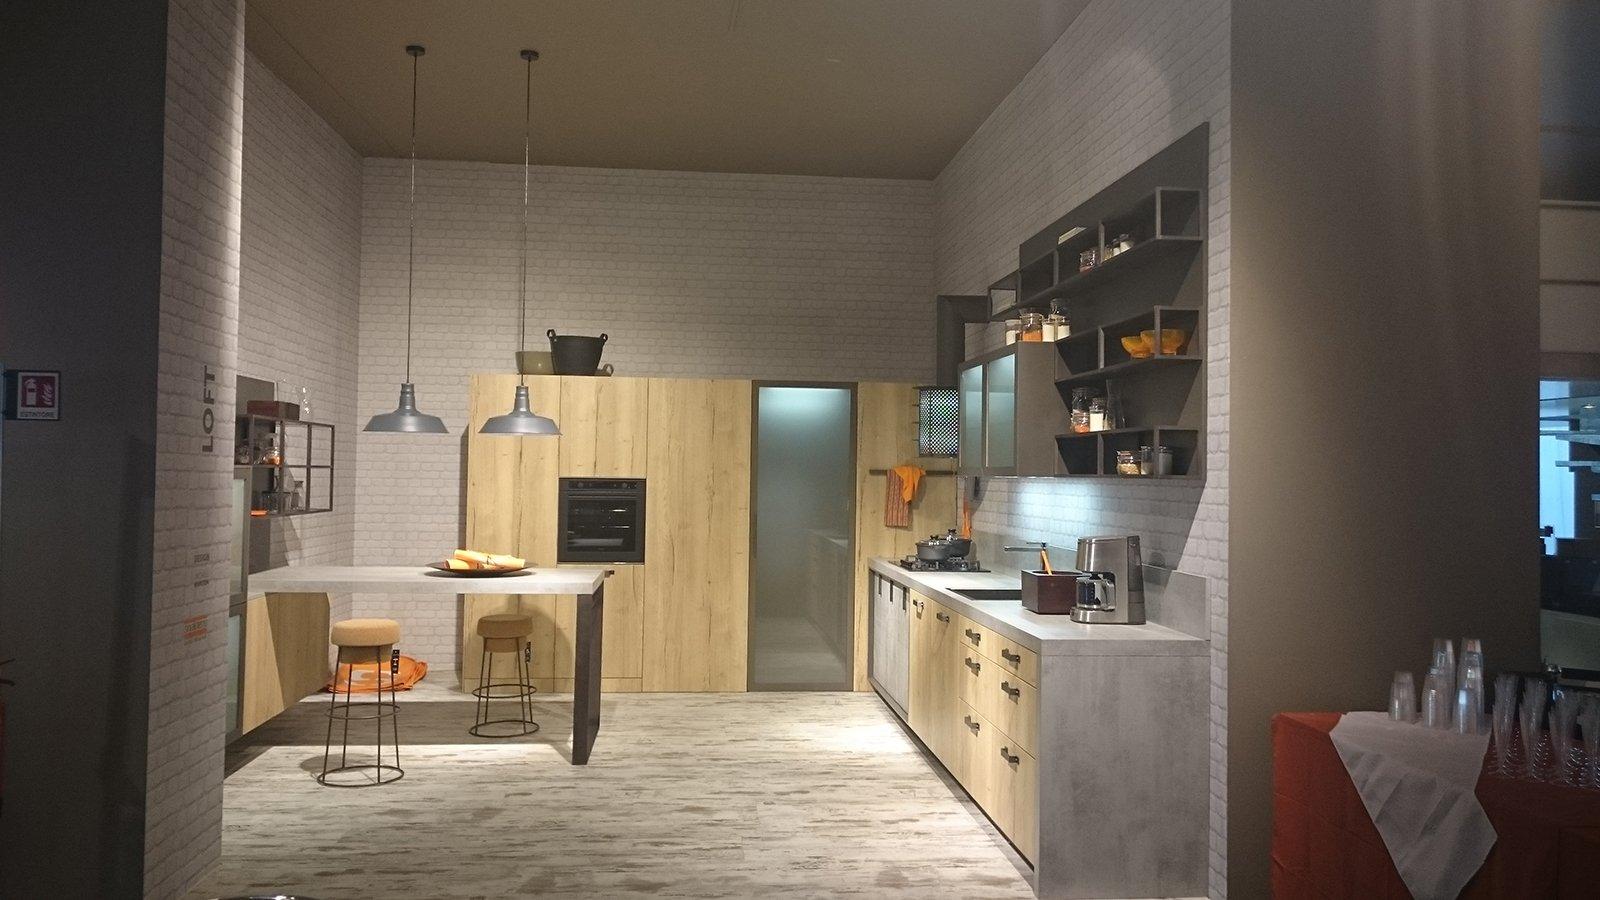 Cucine in mostra al party design food di snaidero cose - Cucine per loft ...